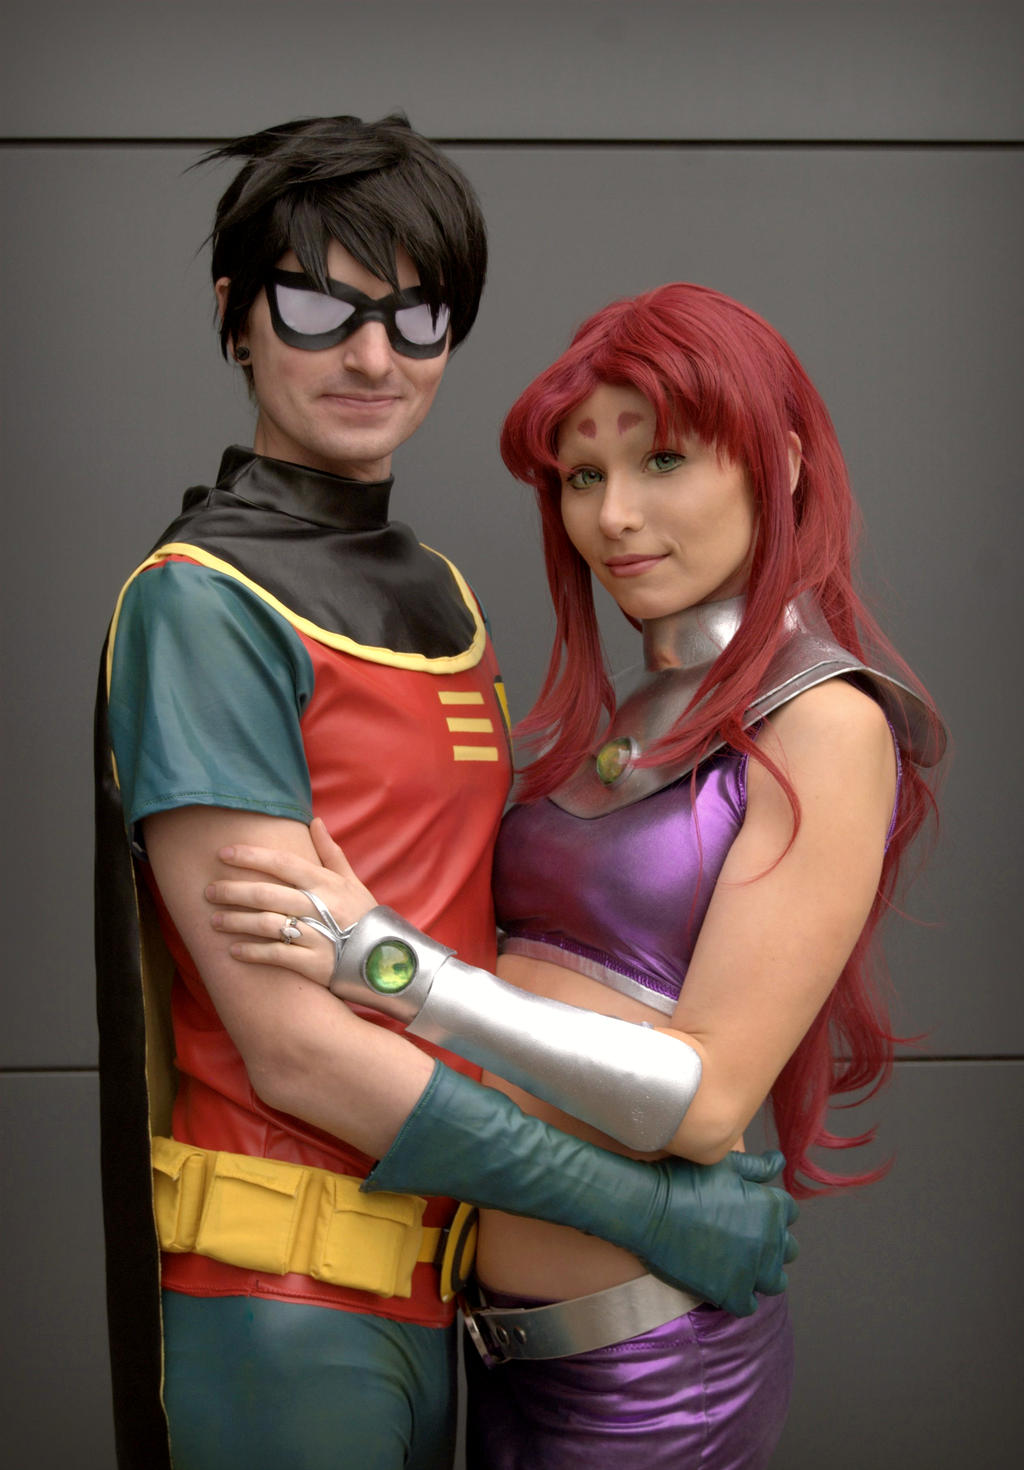 and cosplay Robin starfire